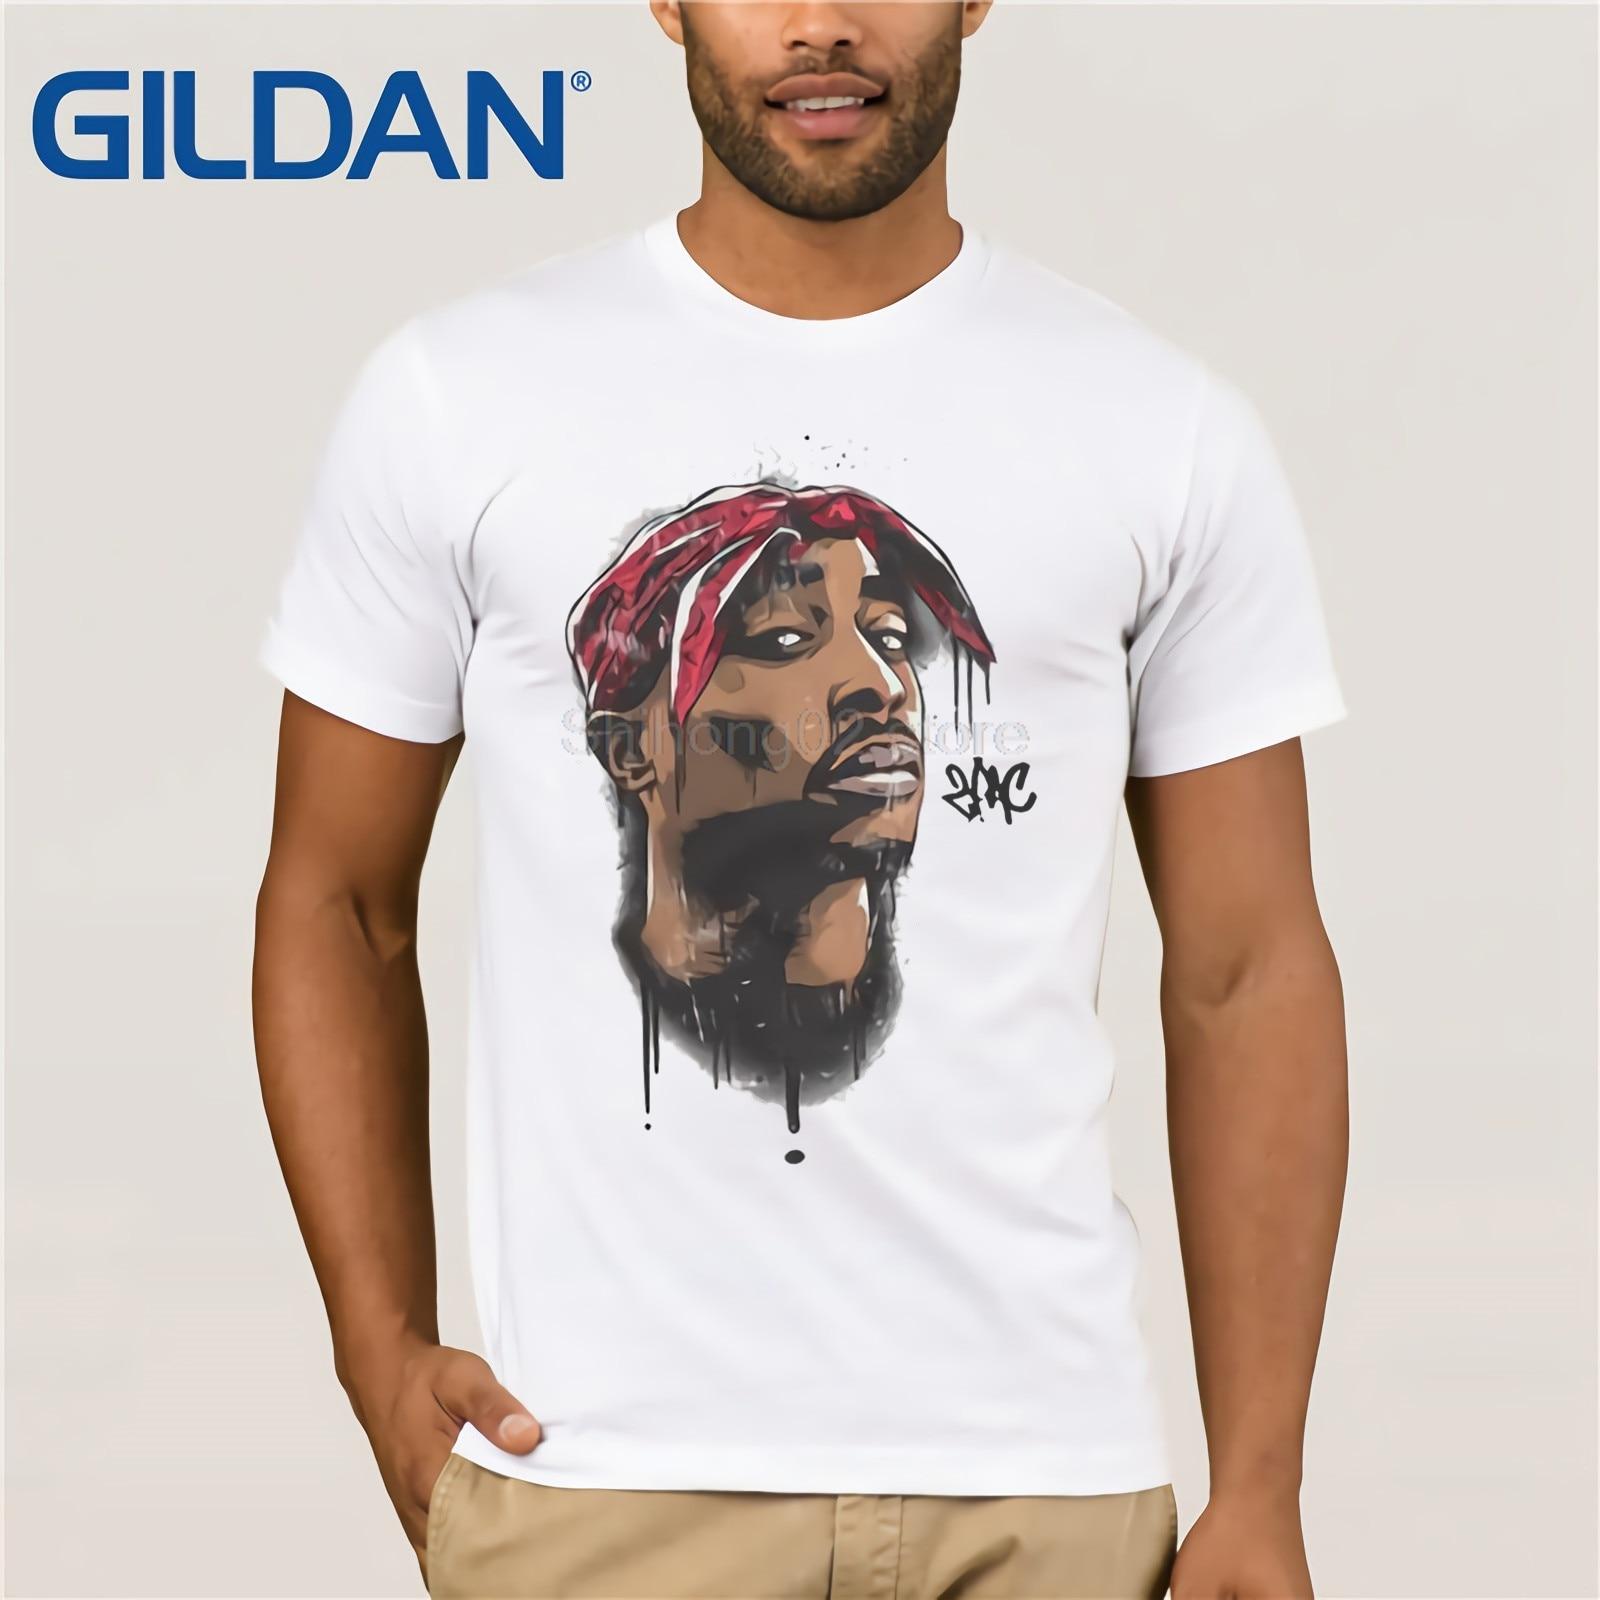 2 Pac Cartoon T Shirt,2PAC Vinyl Home Decor Wall Decal Tshirt,Short-Sleeve,unisex T-Shirt